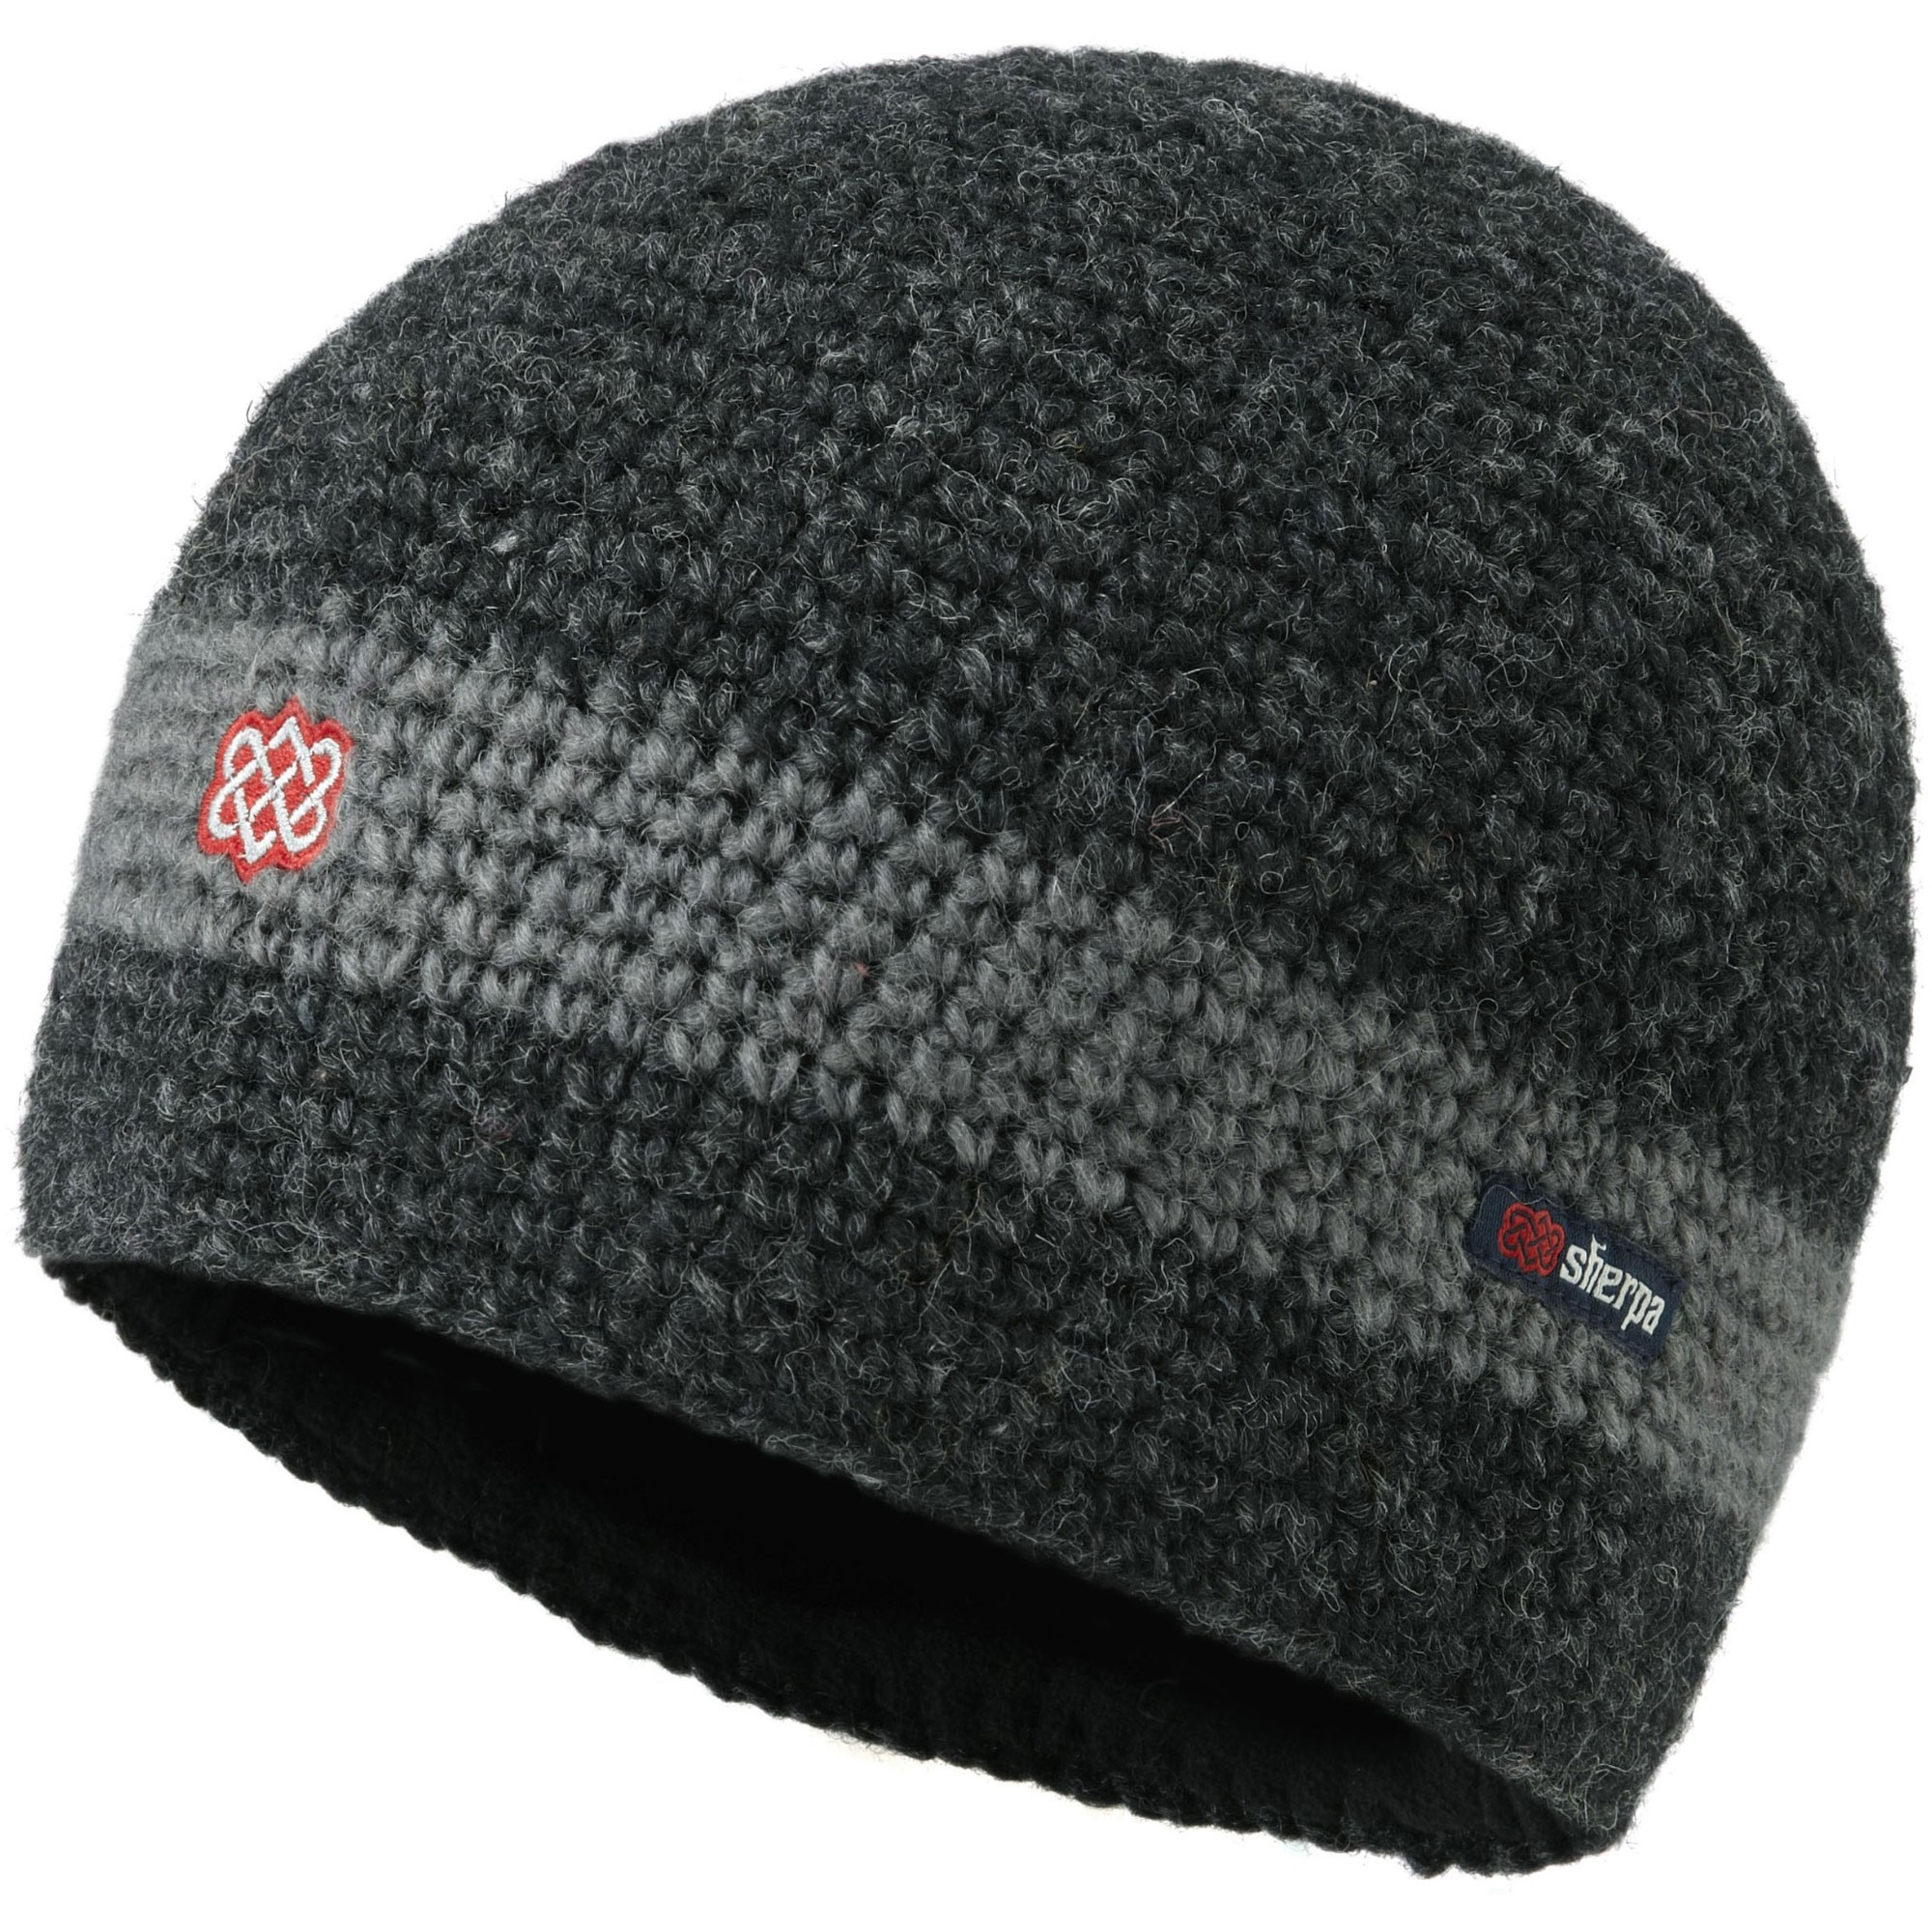 Sherpa Renzing Hat - Monsoon Grey